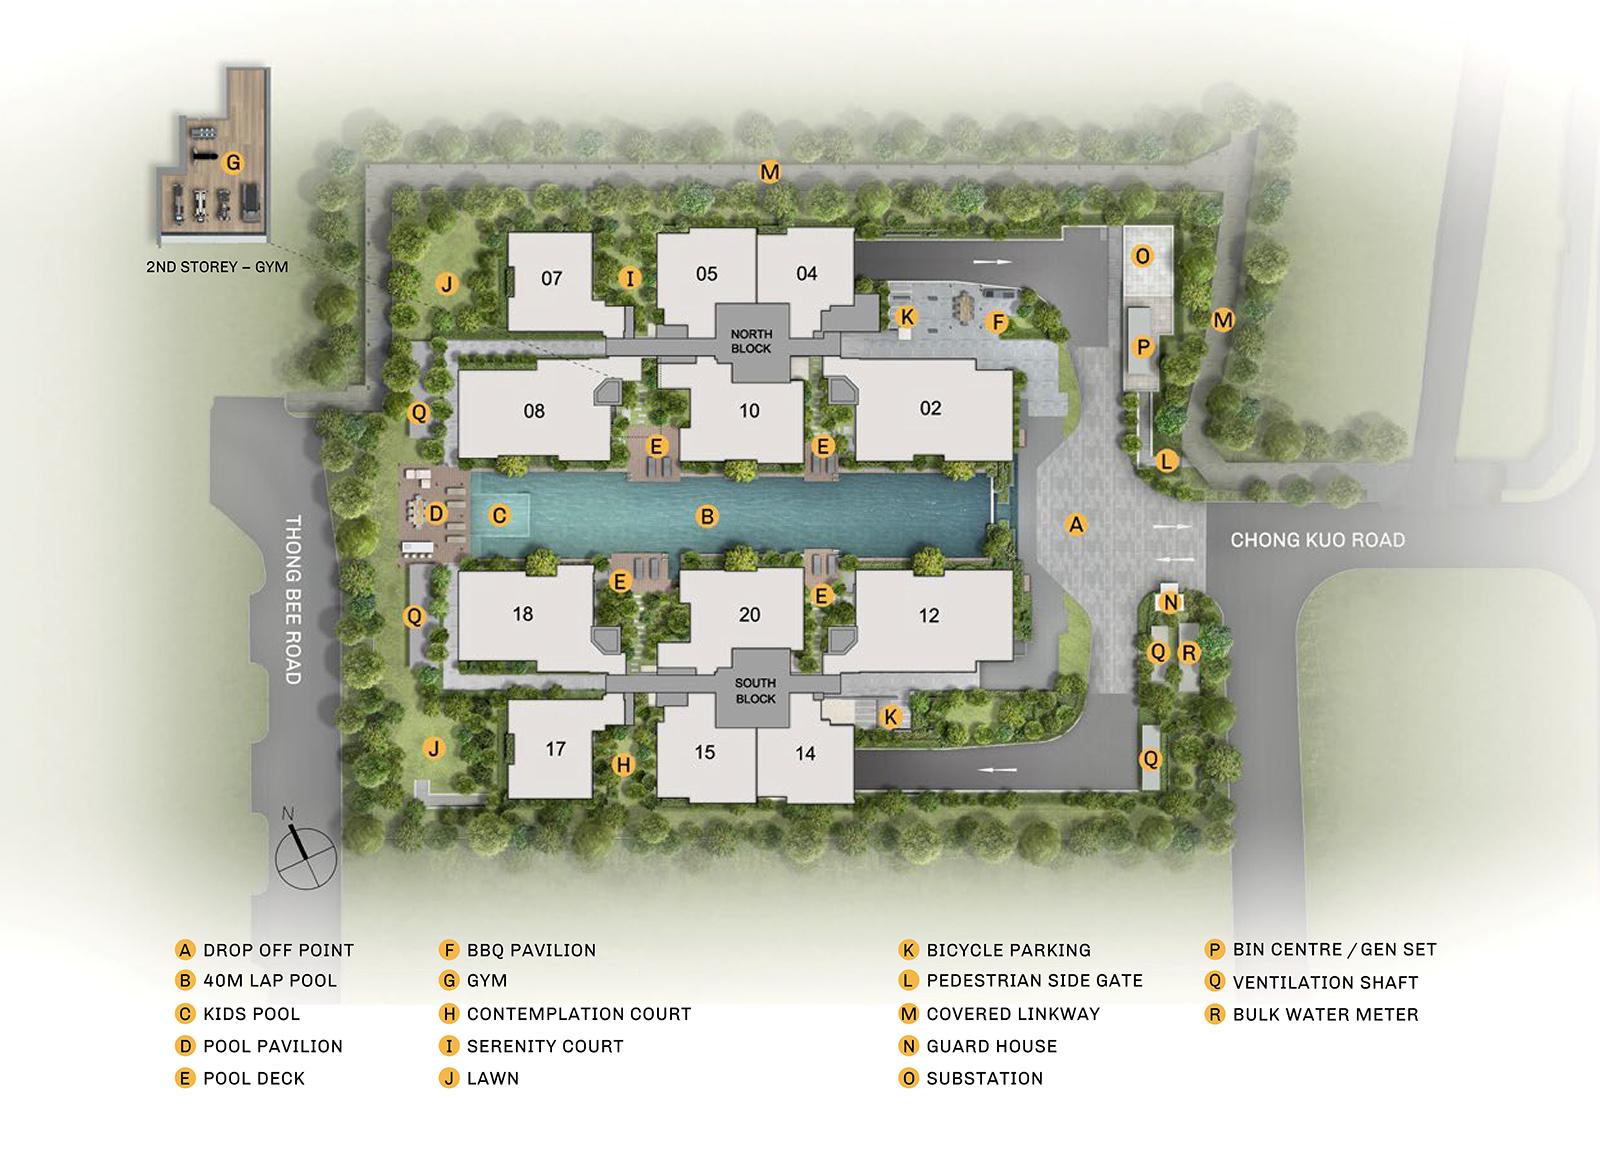 new-condo-singapore-the-esscence-site-plan